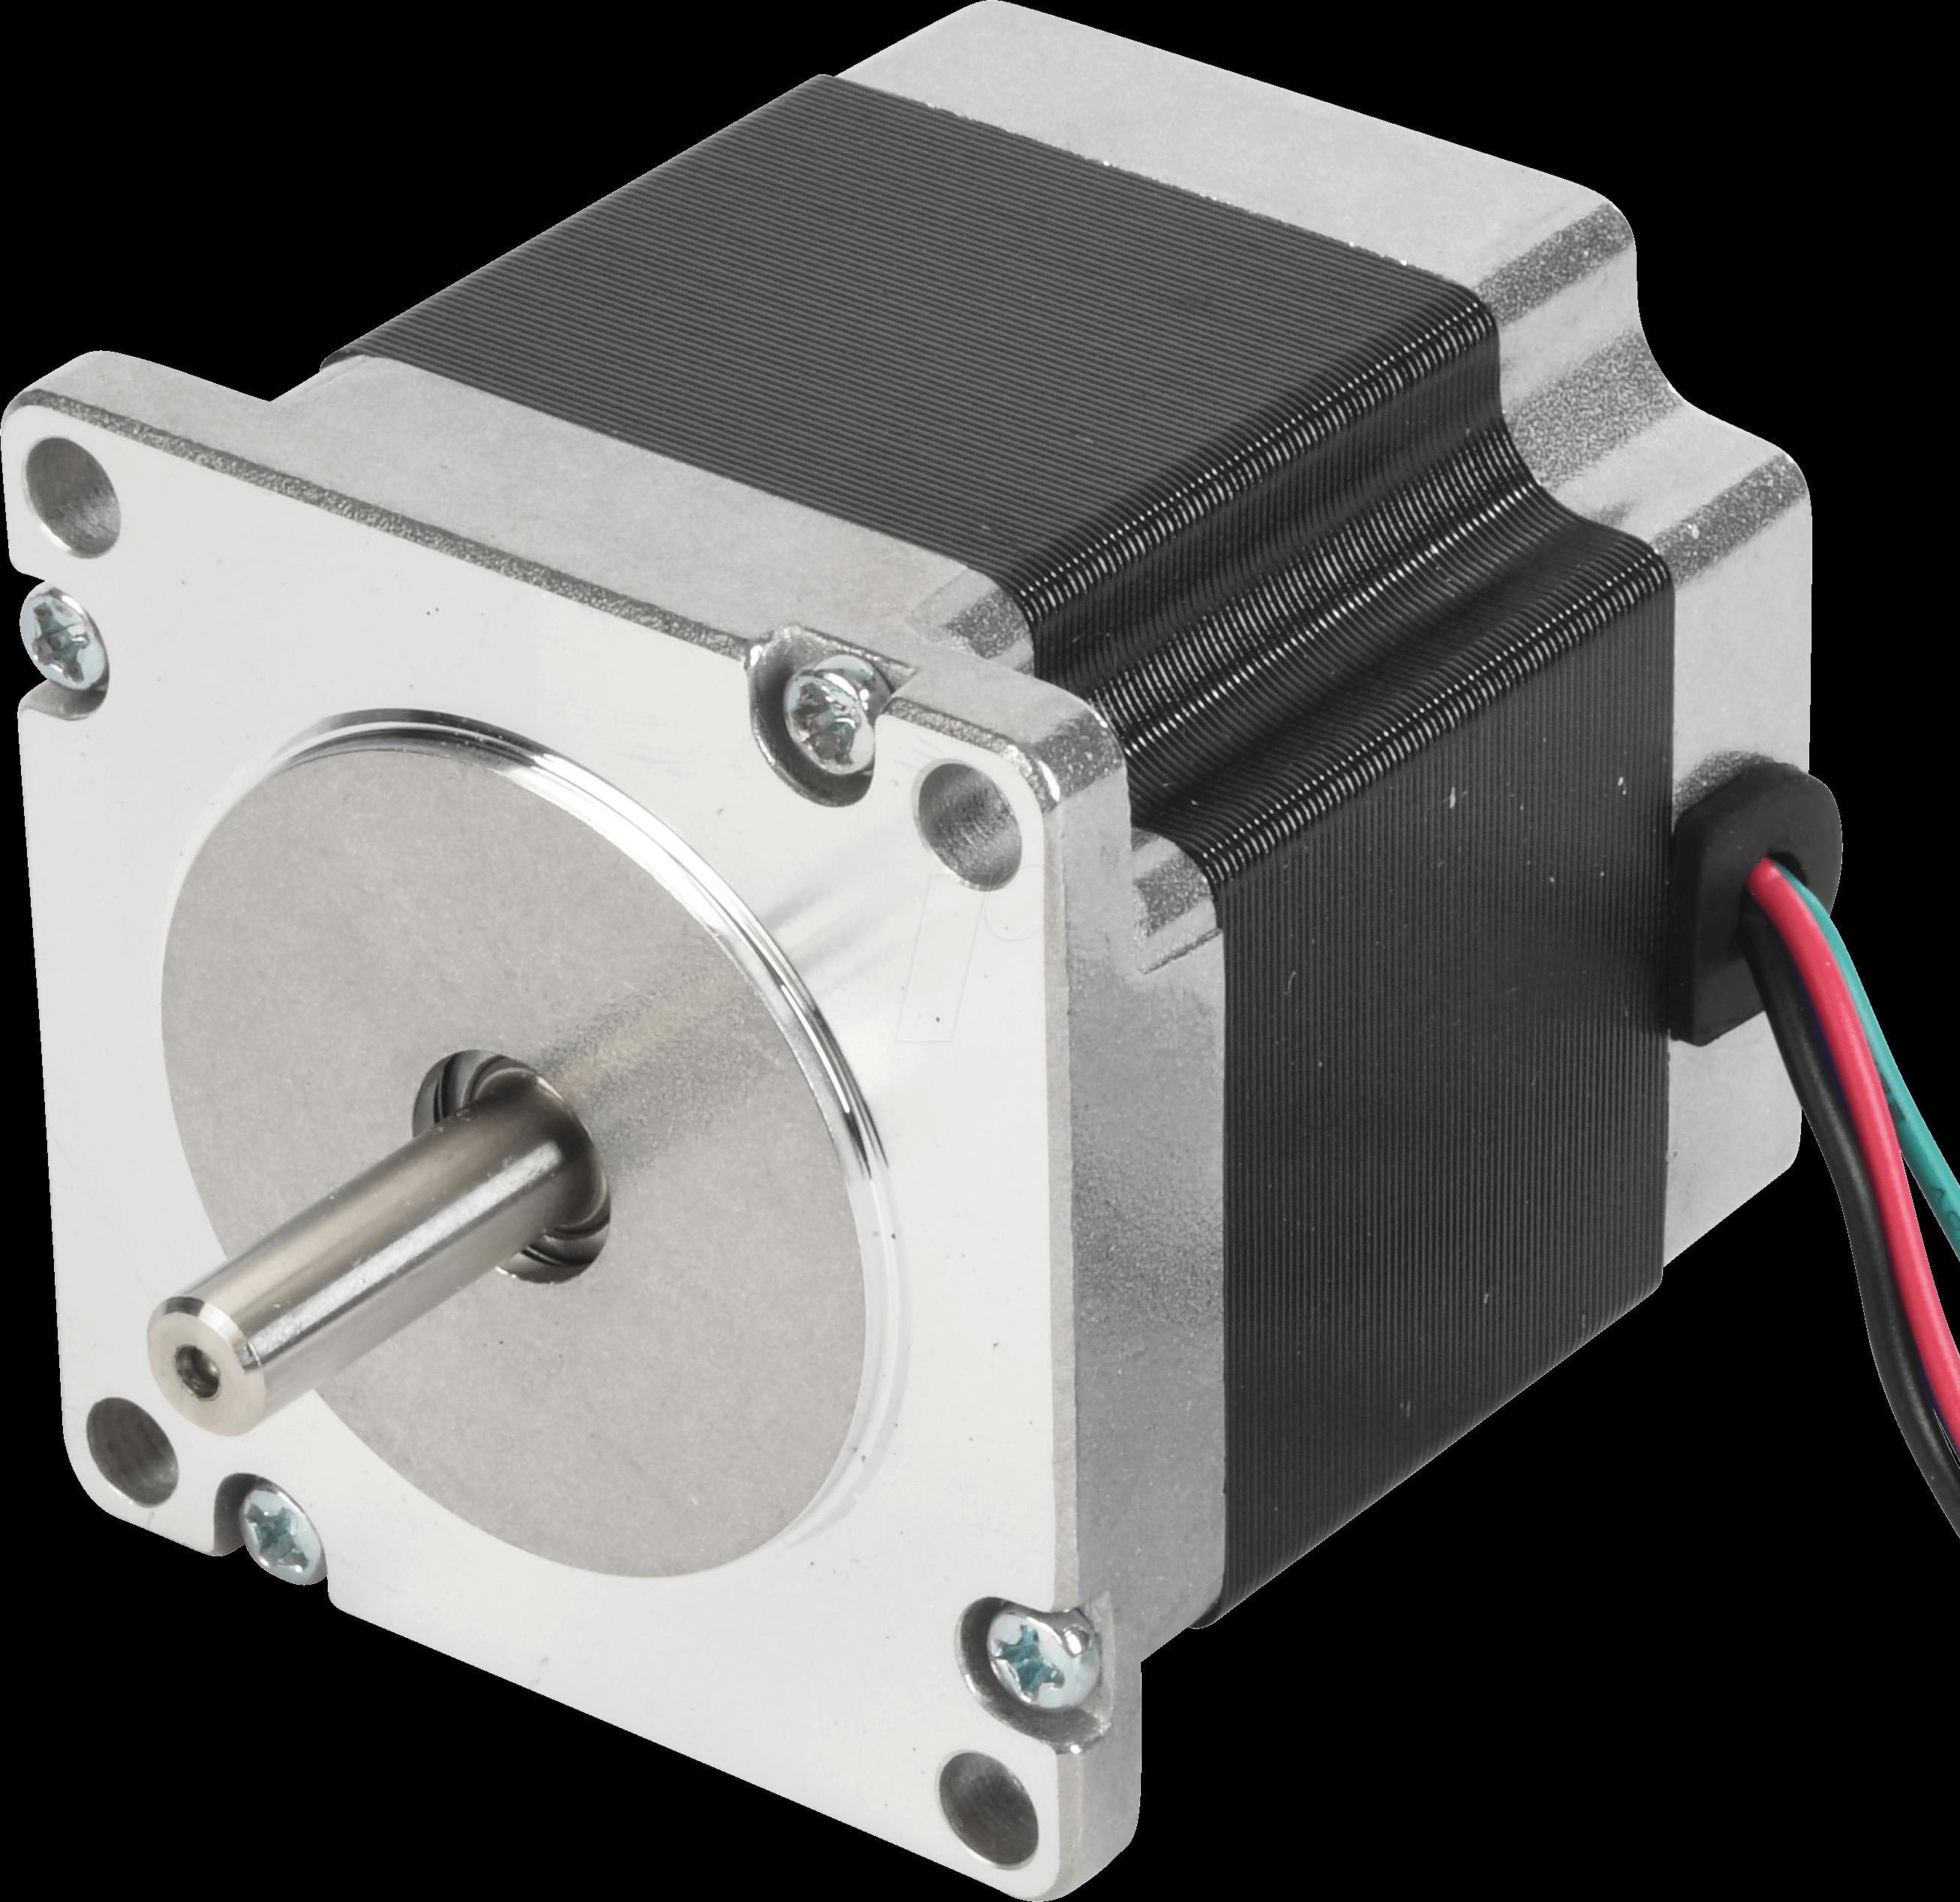 ACT 23HS6430 - Schrittmotor, 4 pol, 1,8 °, 2,4 V DC